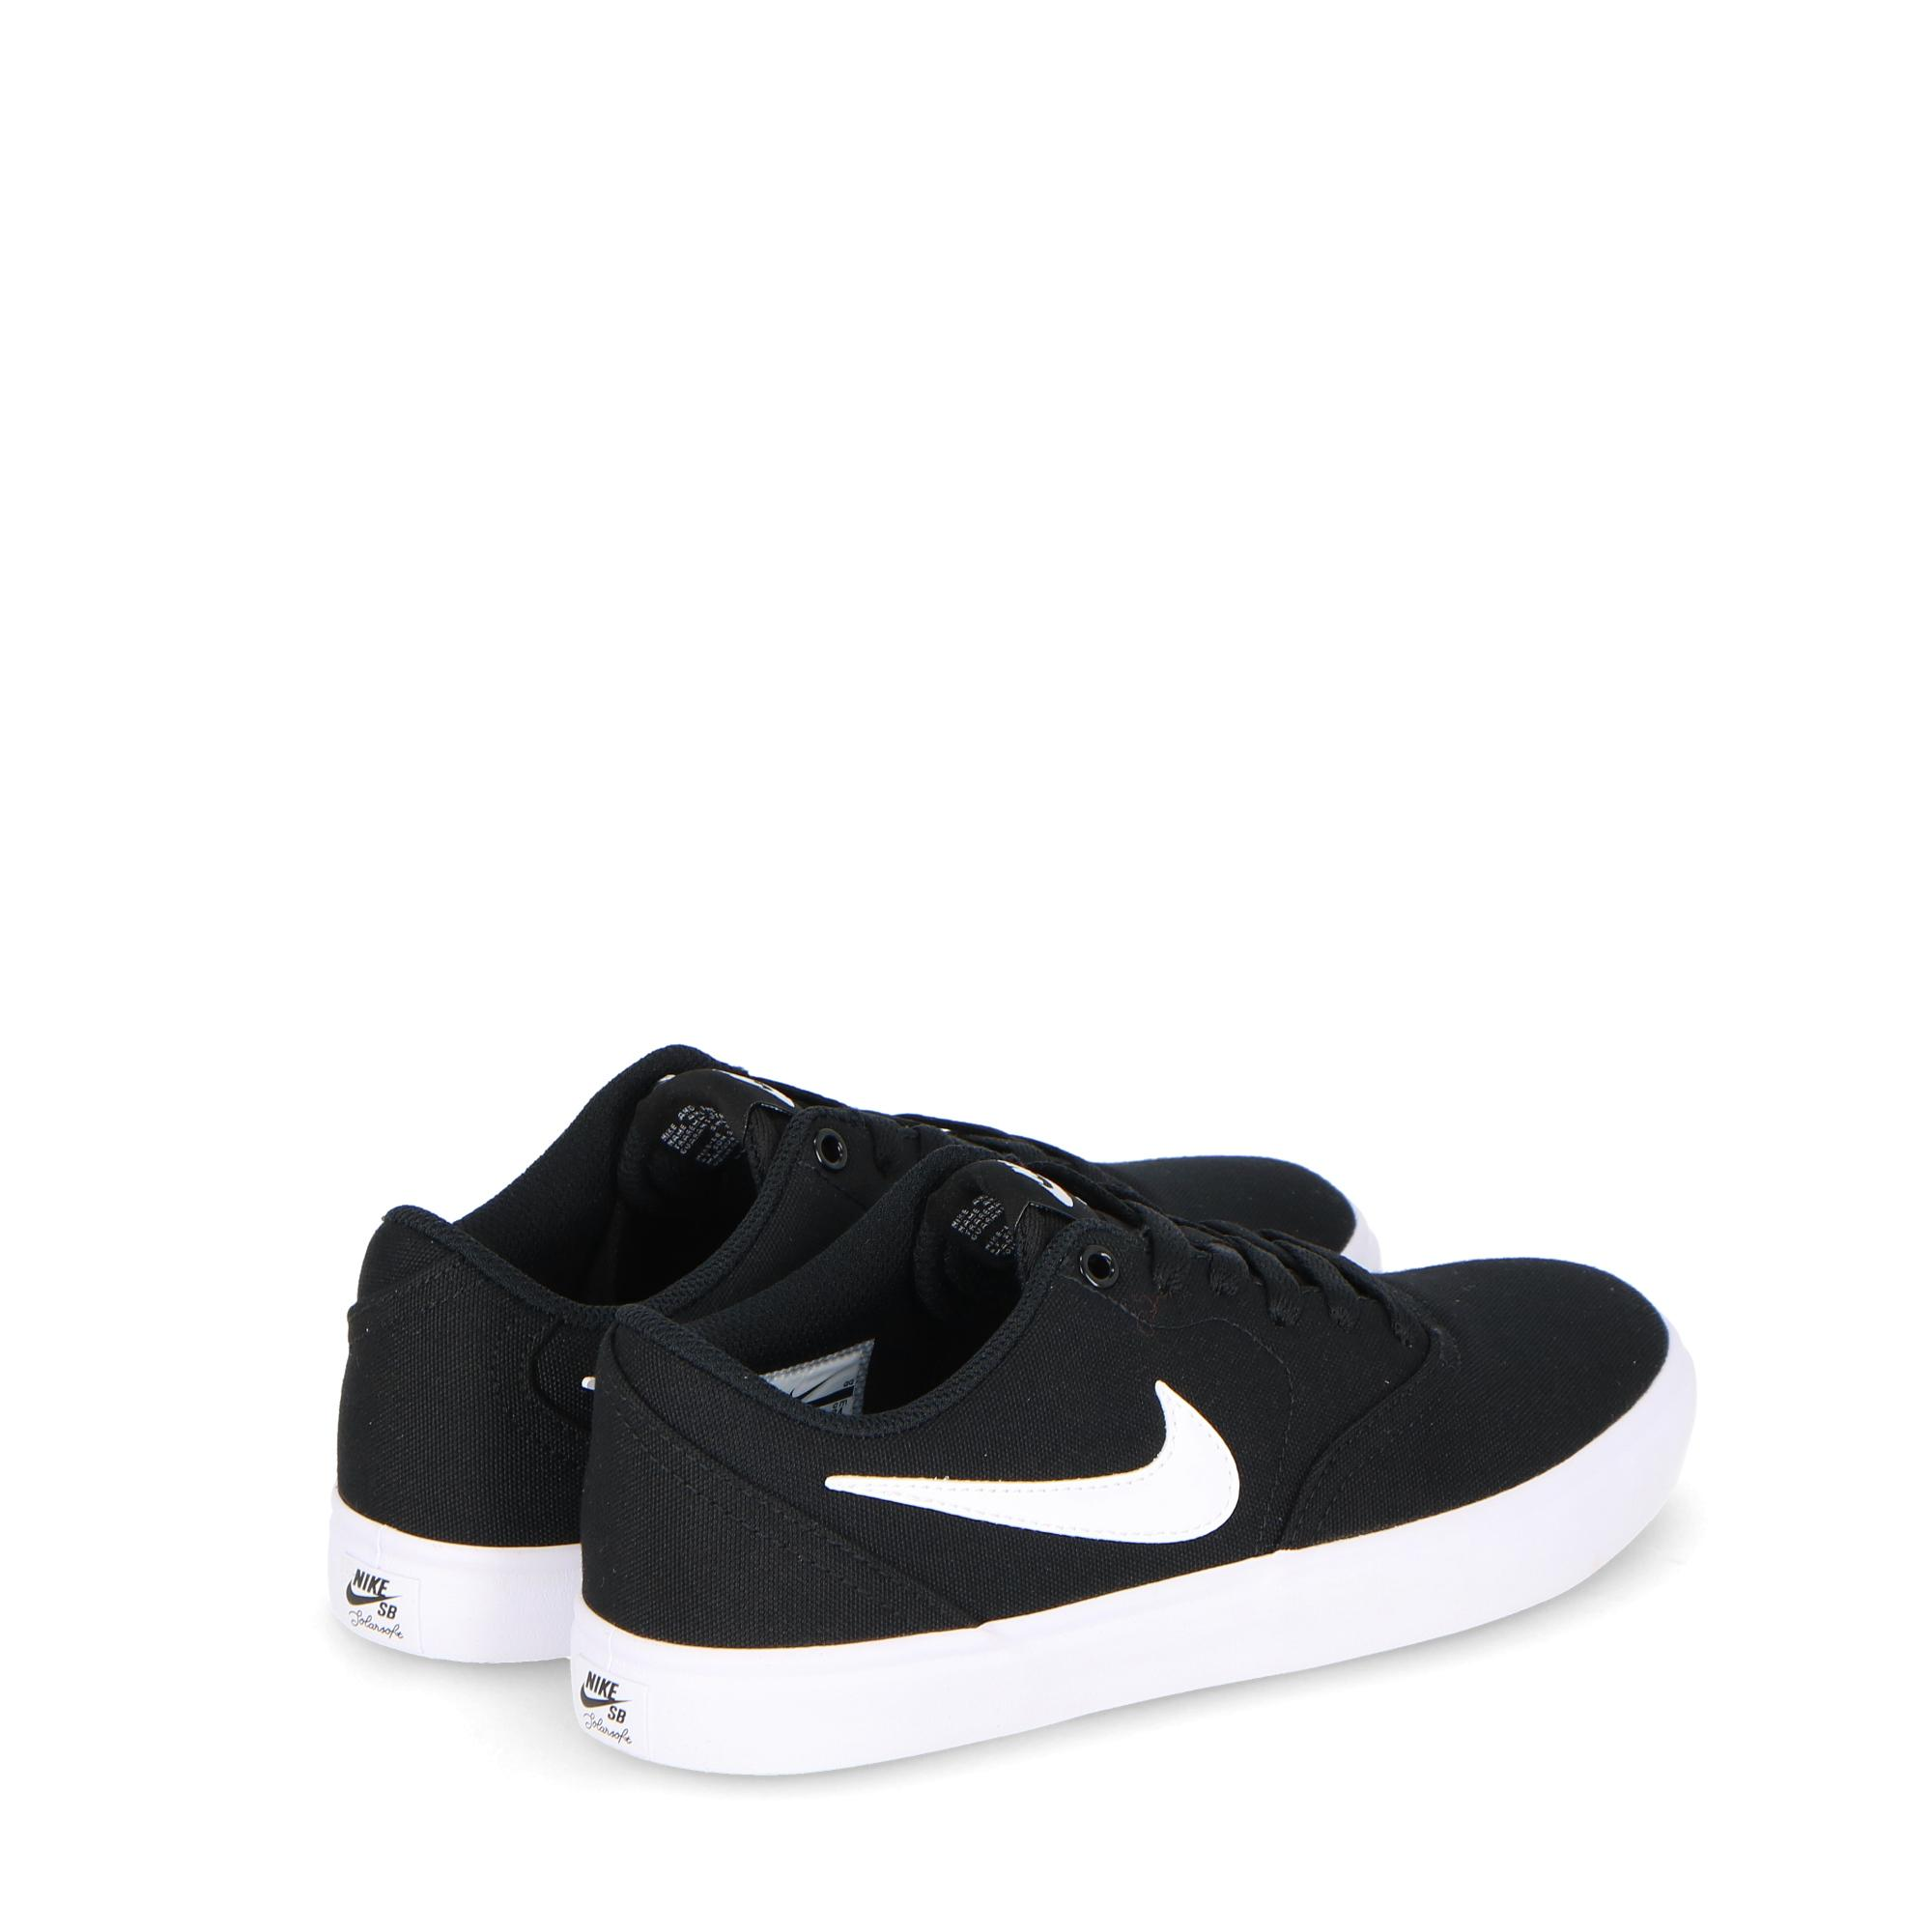 san francisco 98af2 b2b73 Nike Sb Check Solar Canvas Black white